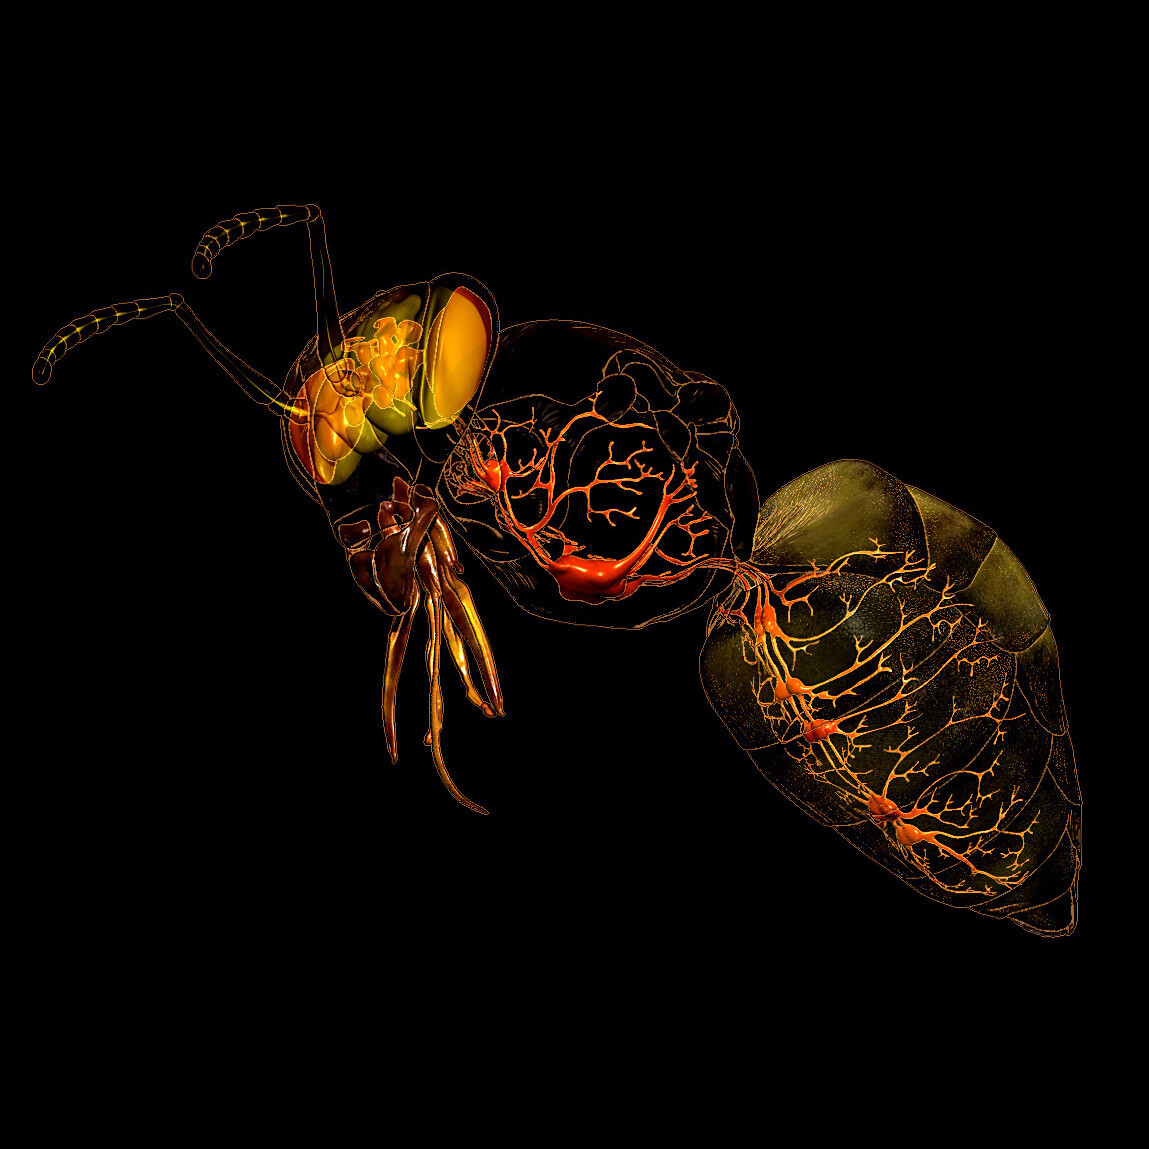 Eric keller bee nervous system insta 02